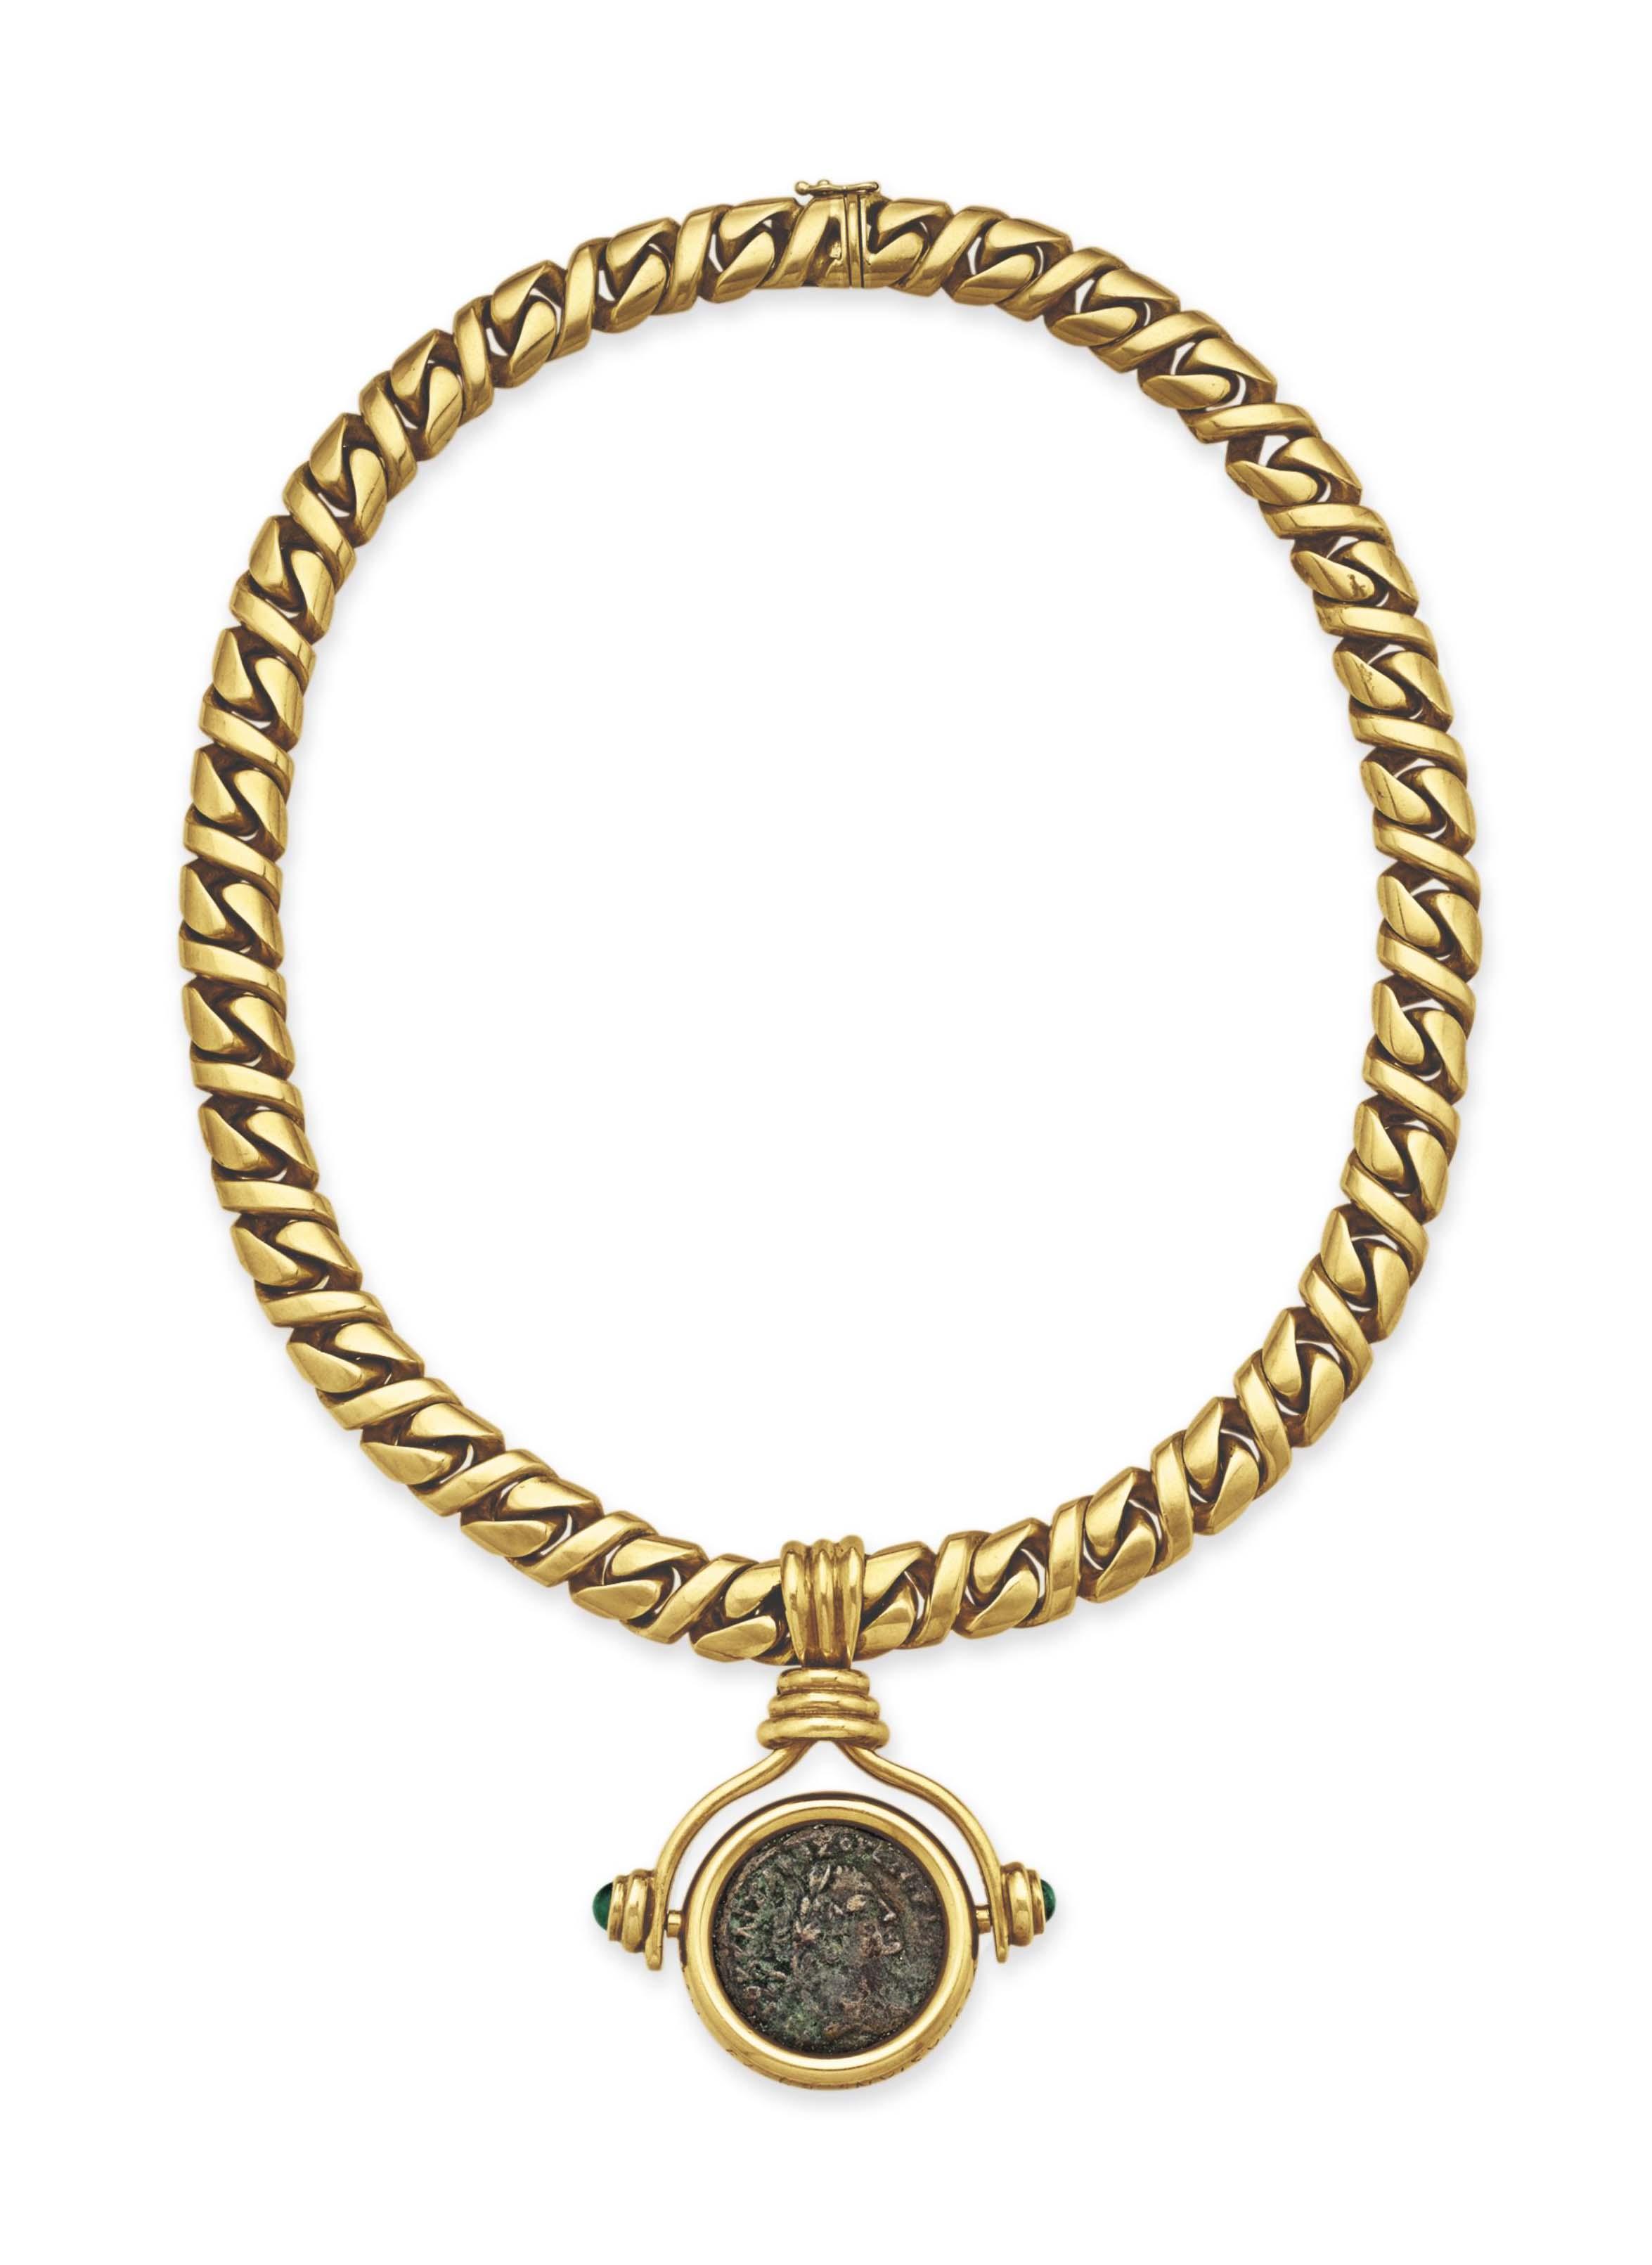 A GOLD COIN NECKLACE